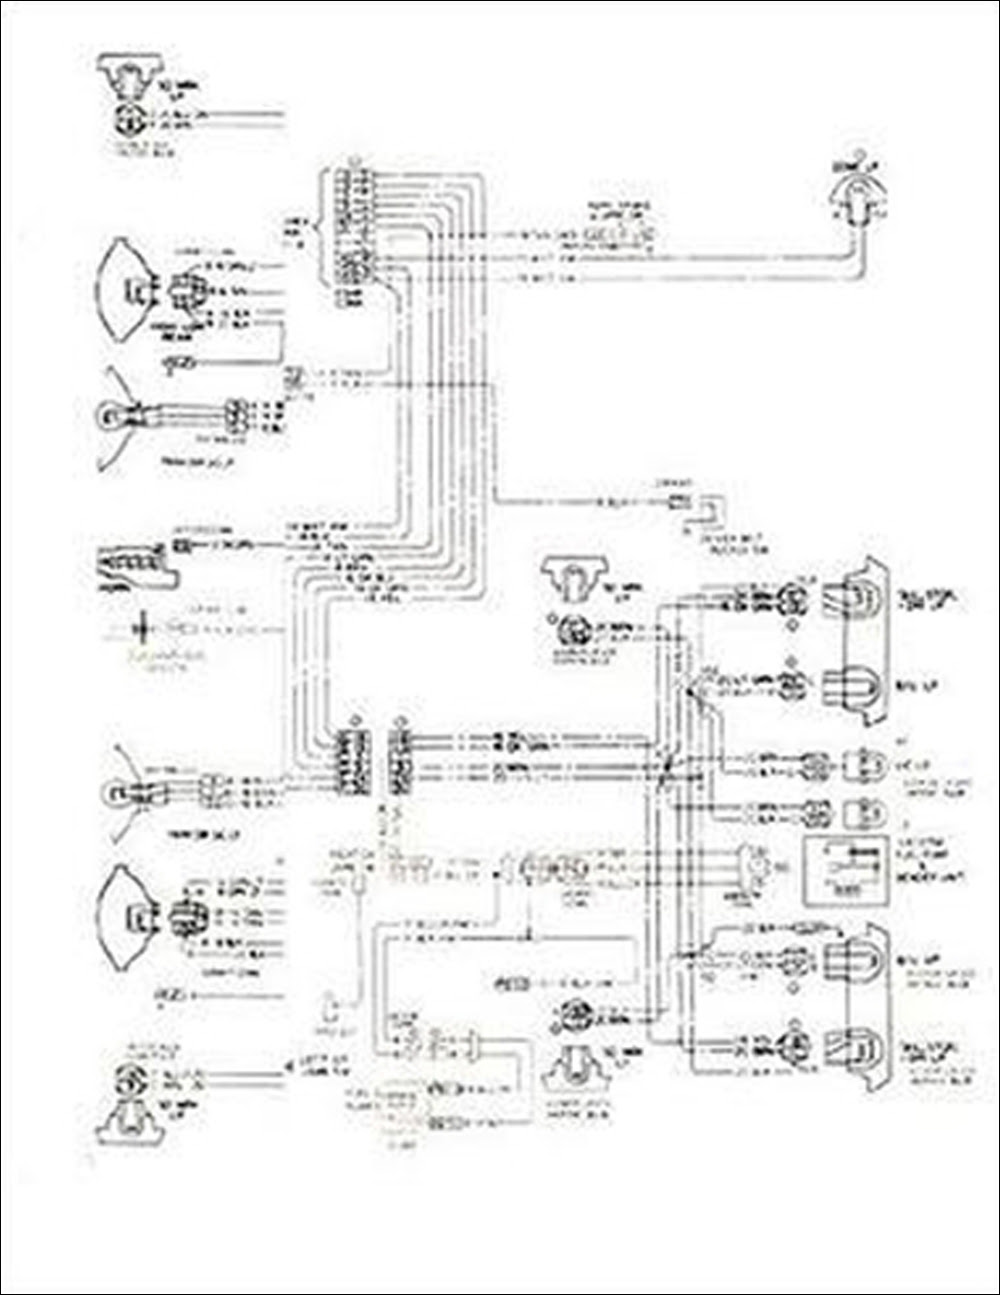 Diagram 1977 Chevrolet Vega Wiring Diagram Full Version Hd Quality Wiring Diagram Diagrammaskek Gisbertovalori It